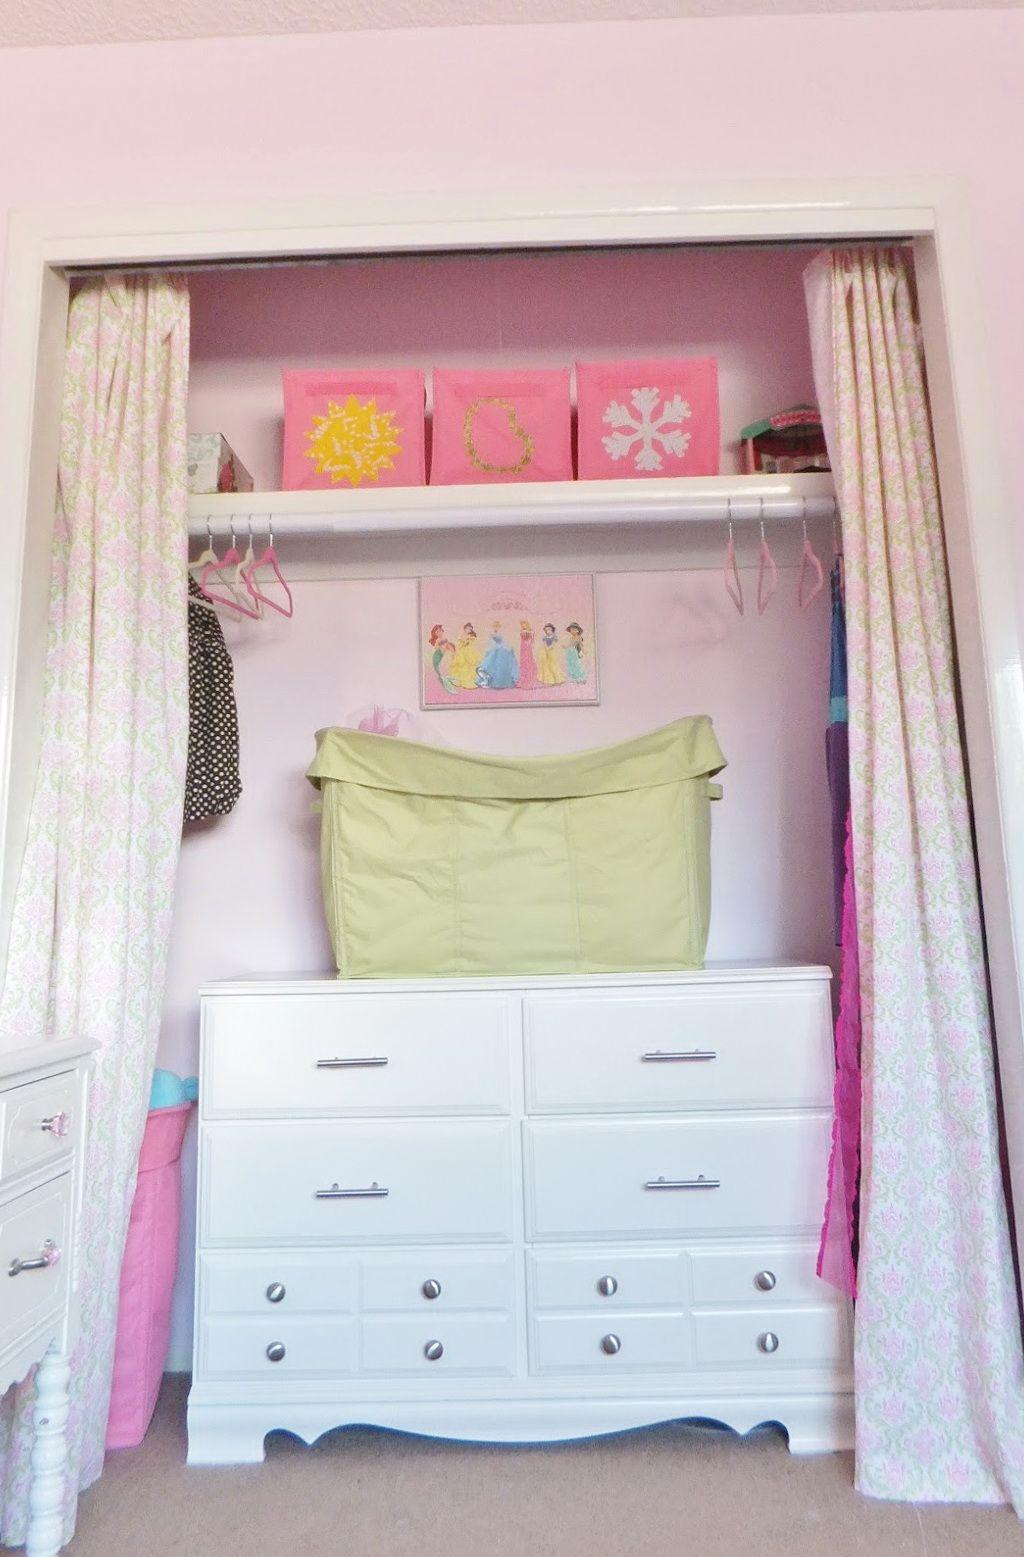 walk in closet design for girls. Perfect Closet Small Walk Closet Ideas For Girls Home Design Organizers Inside Walk In Closet Design For Girls S